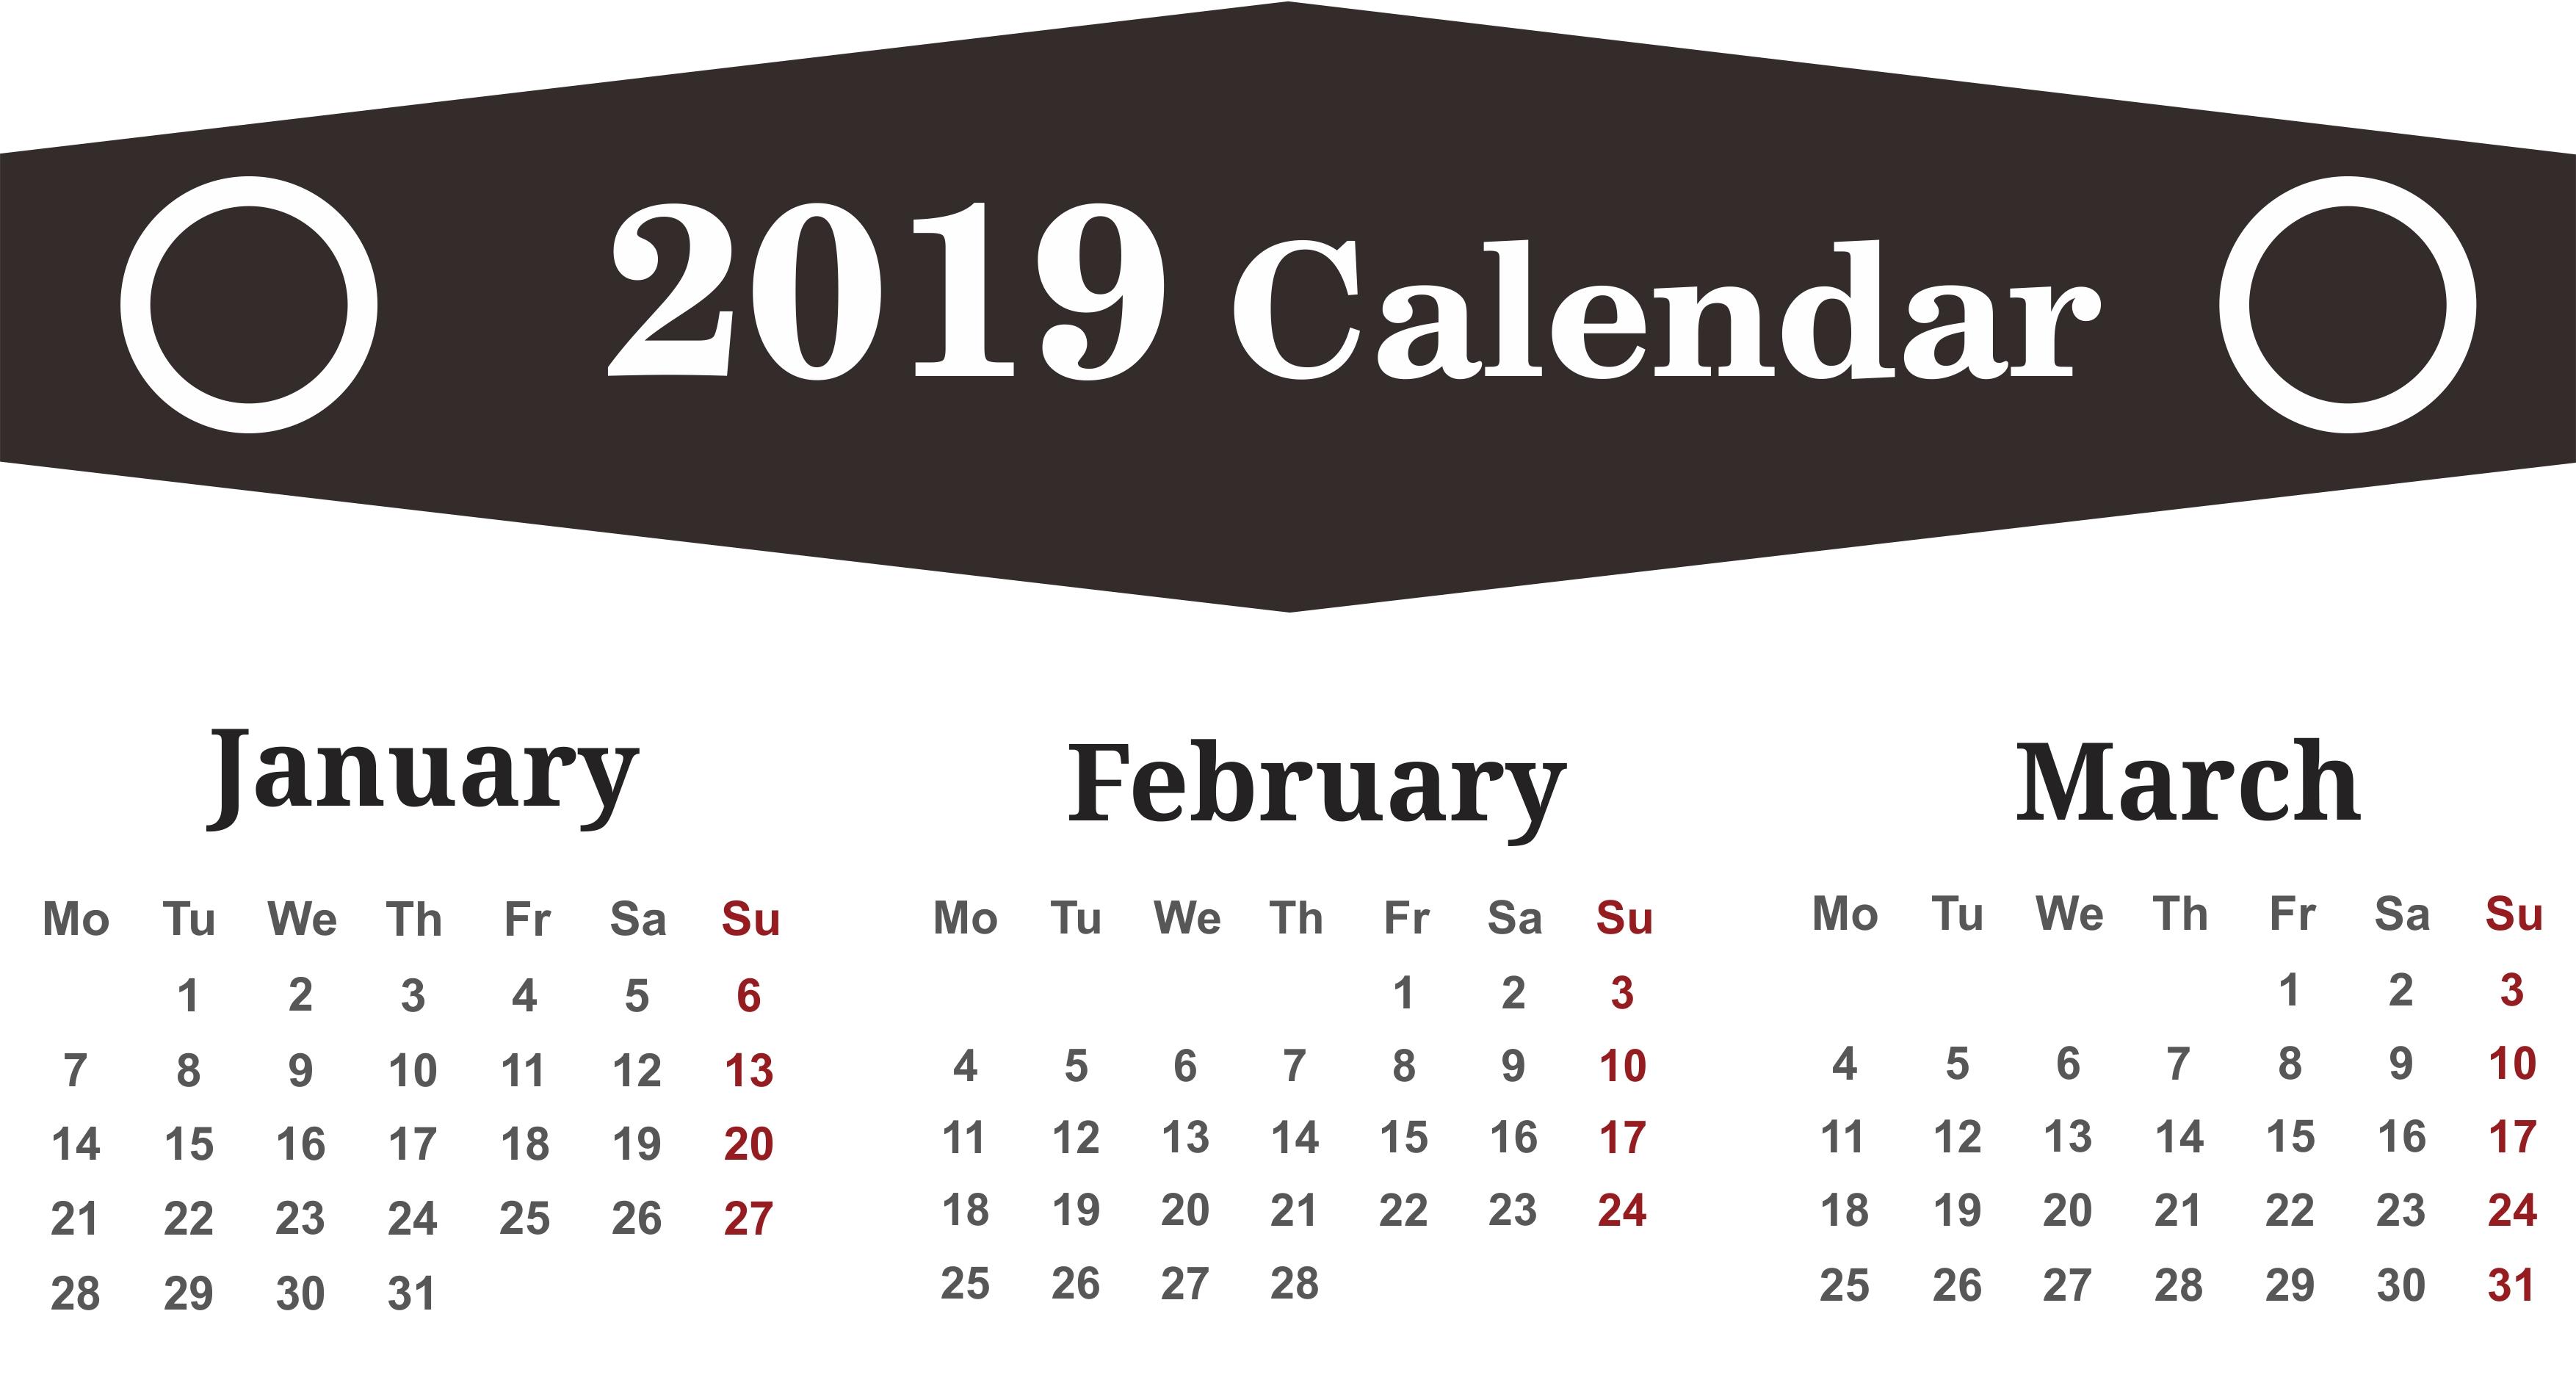 Printable Calendar January February March 2019 Calendar | 250+ March Feb 9 2019 Calendar